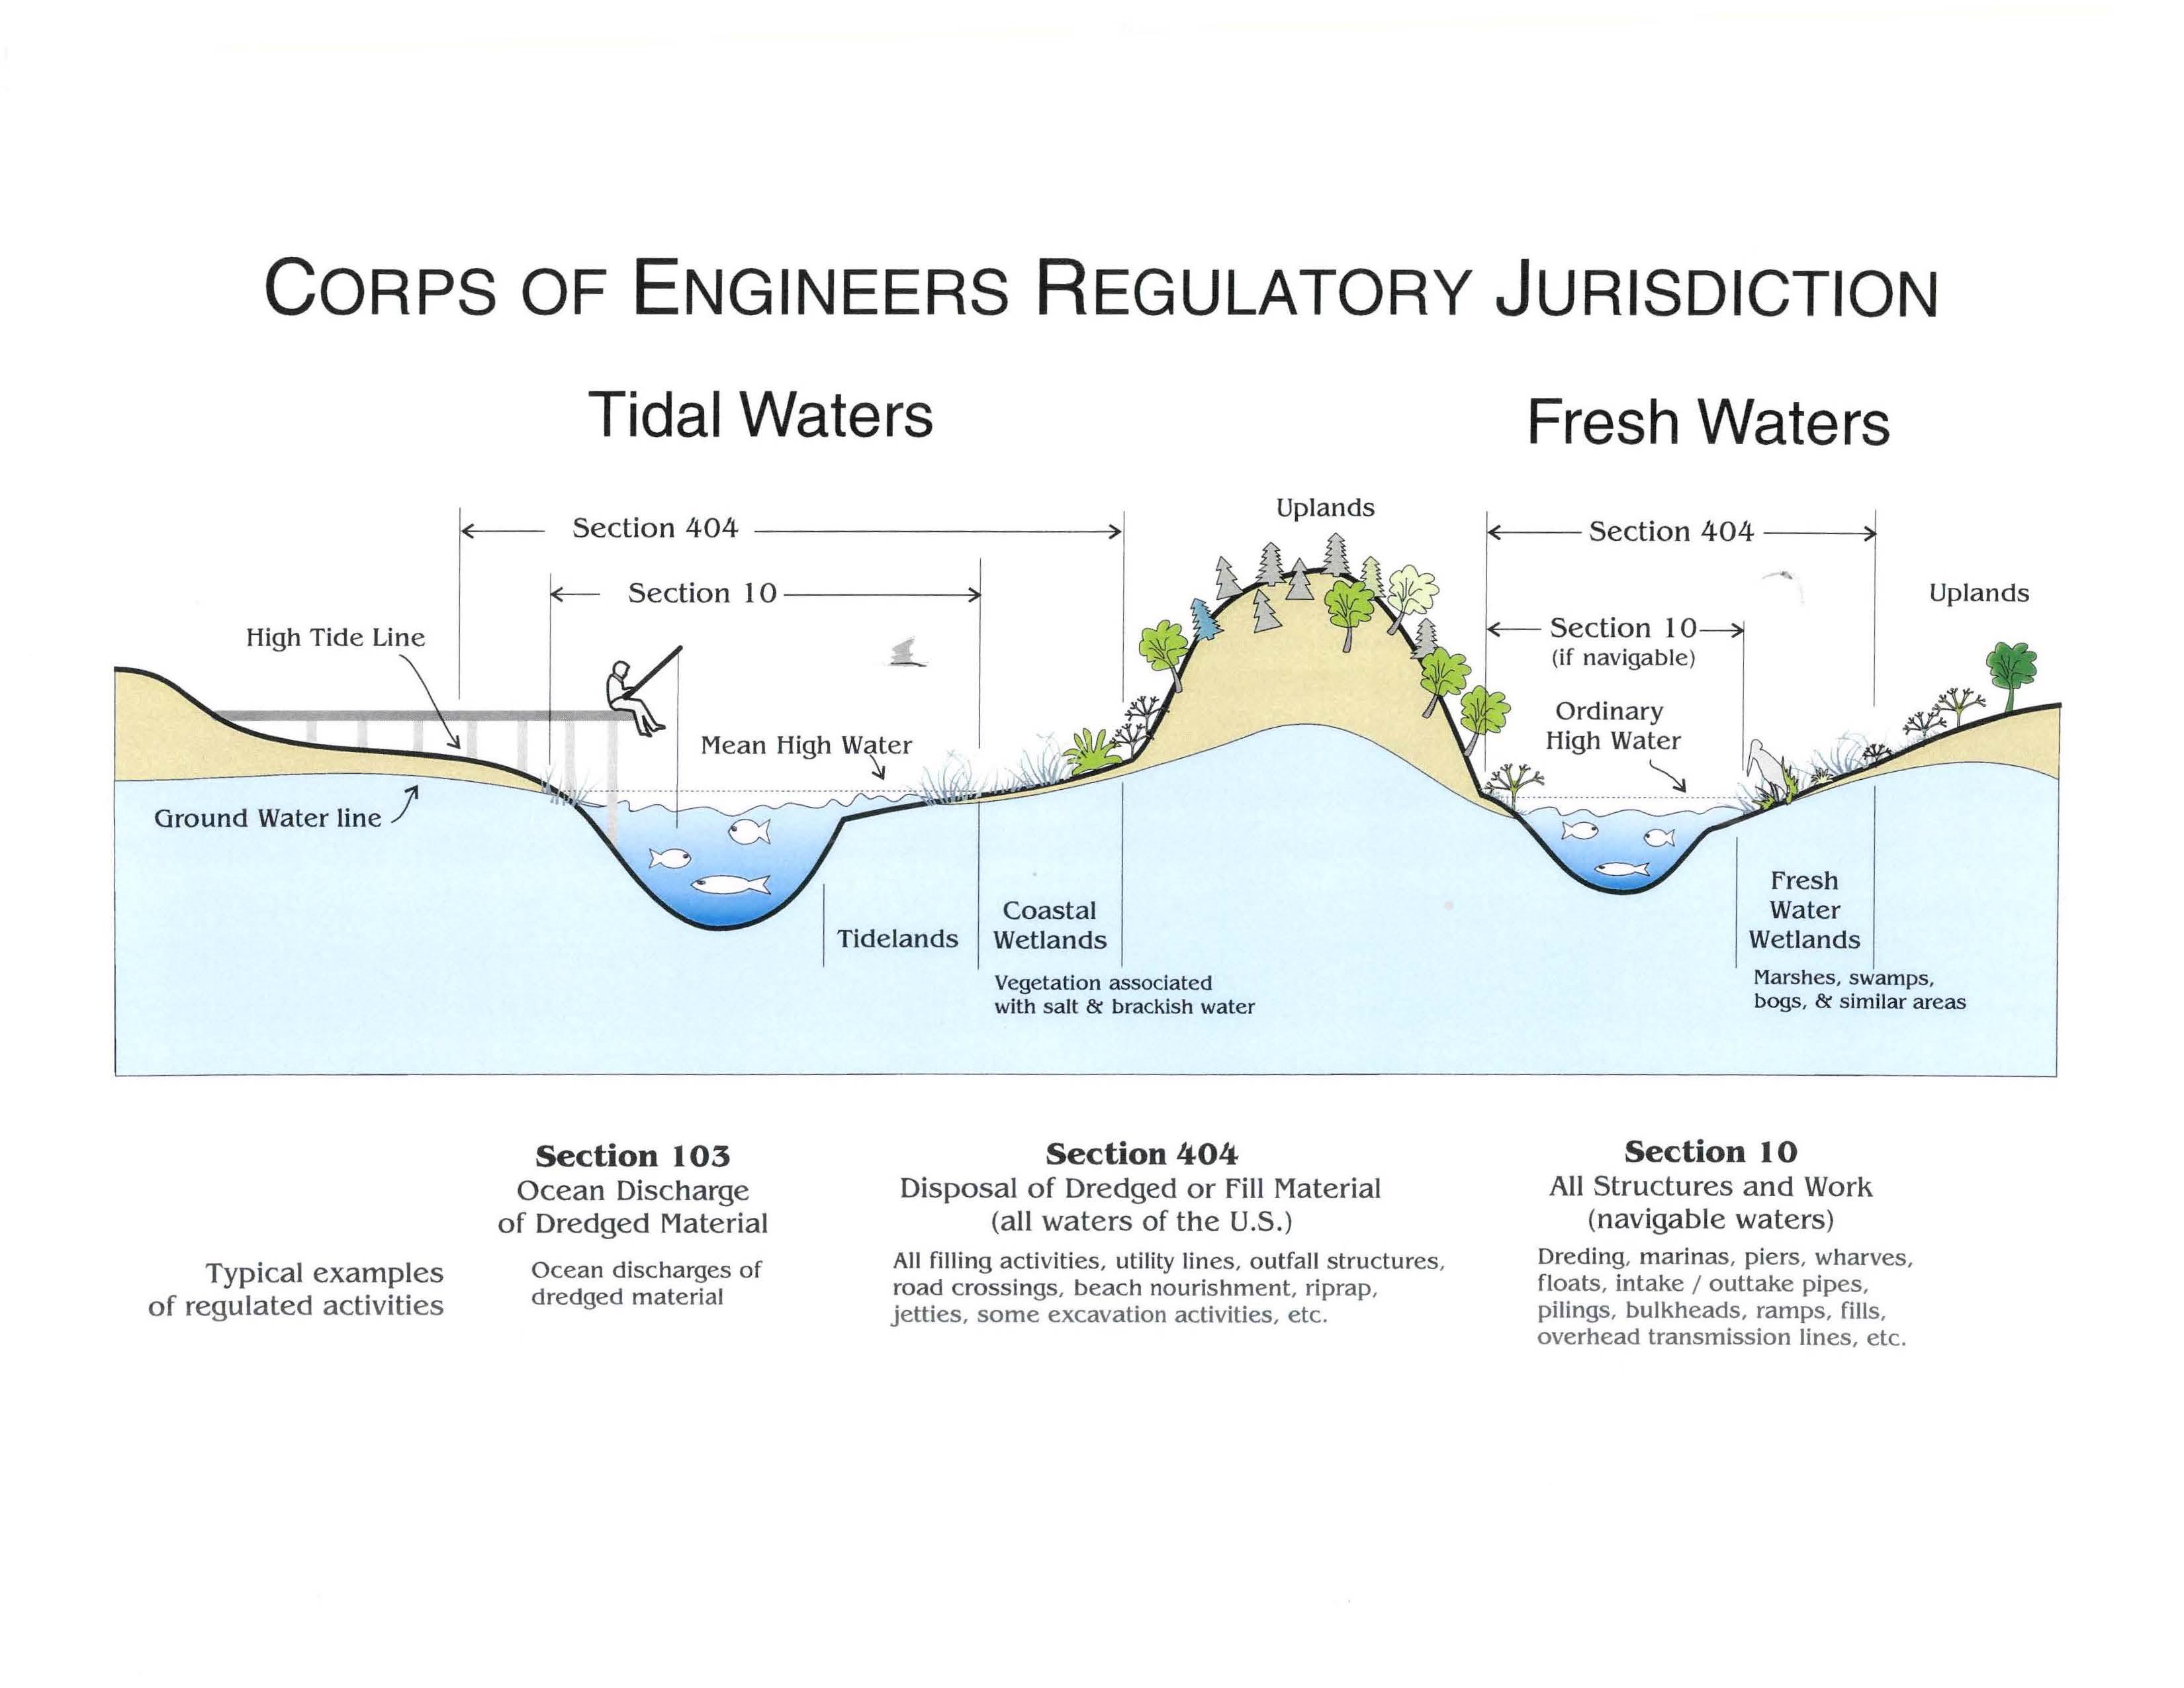 Scope of Corps Regulatory Jurisdiction